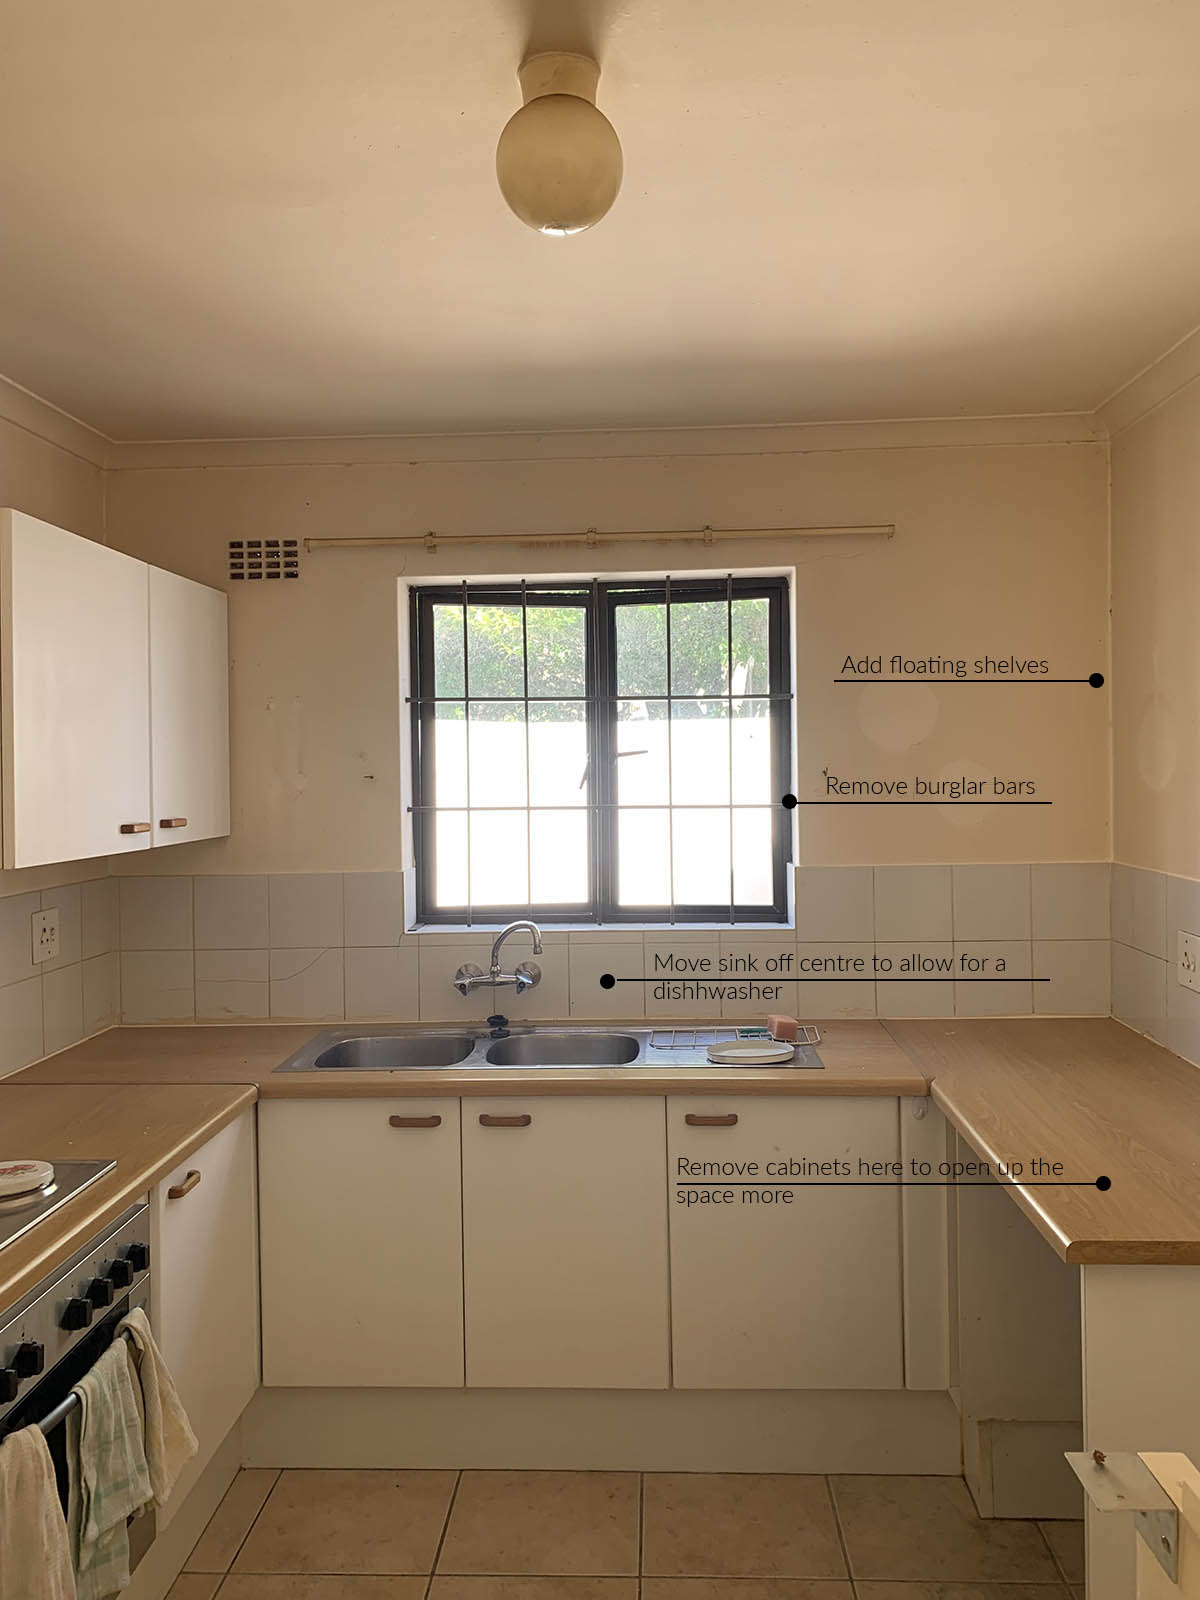 Ths Project House M Kitchen Design Concept The Home Studio Interior Designers